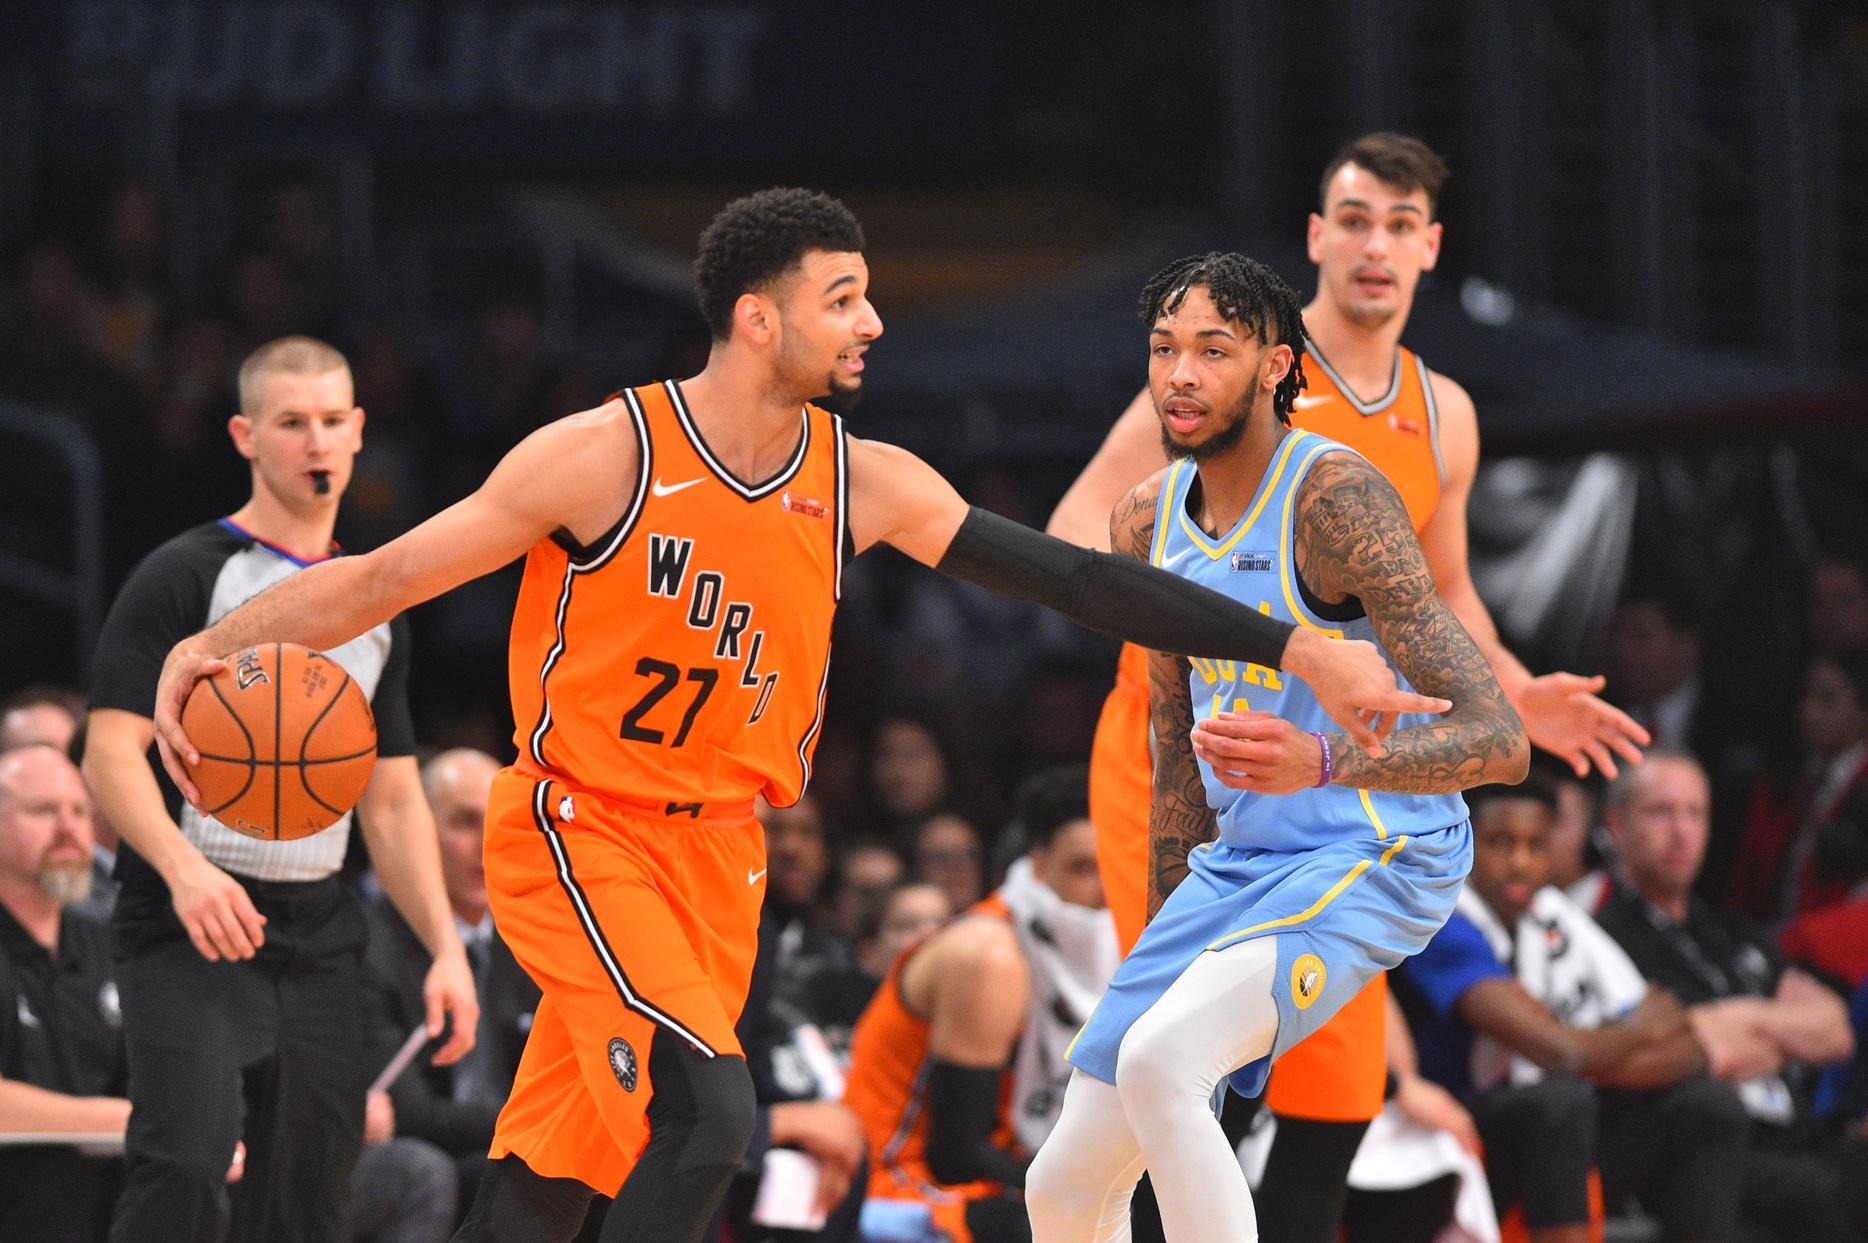 Oklahoma basketball: Buddy Hield calls Trae Young